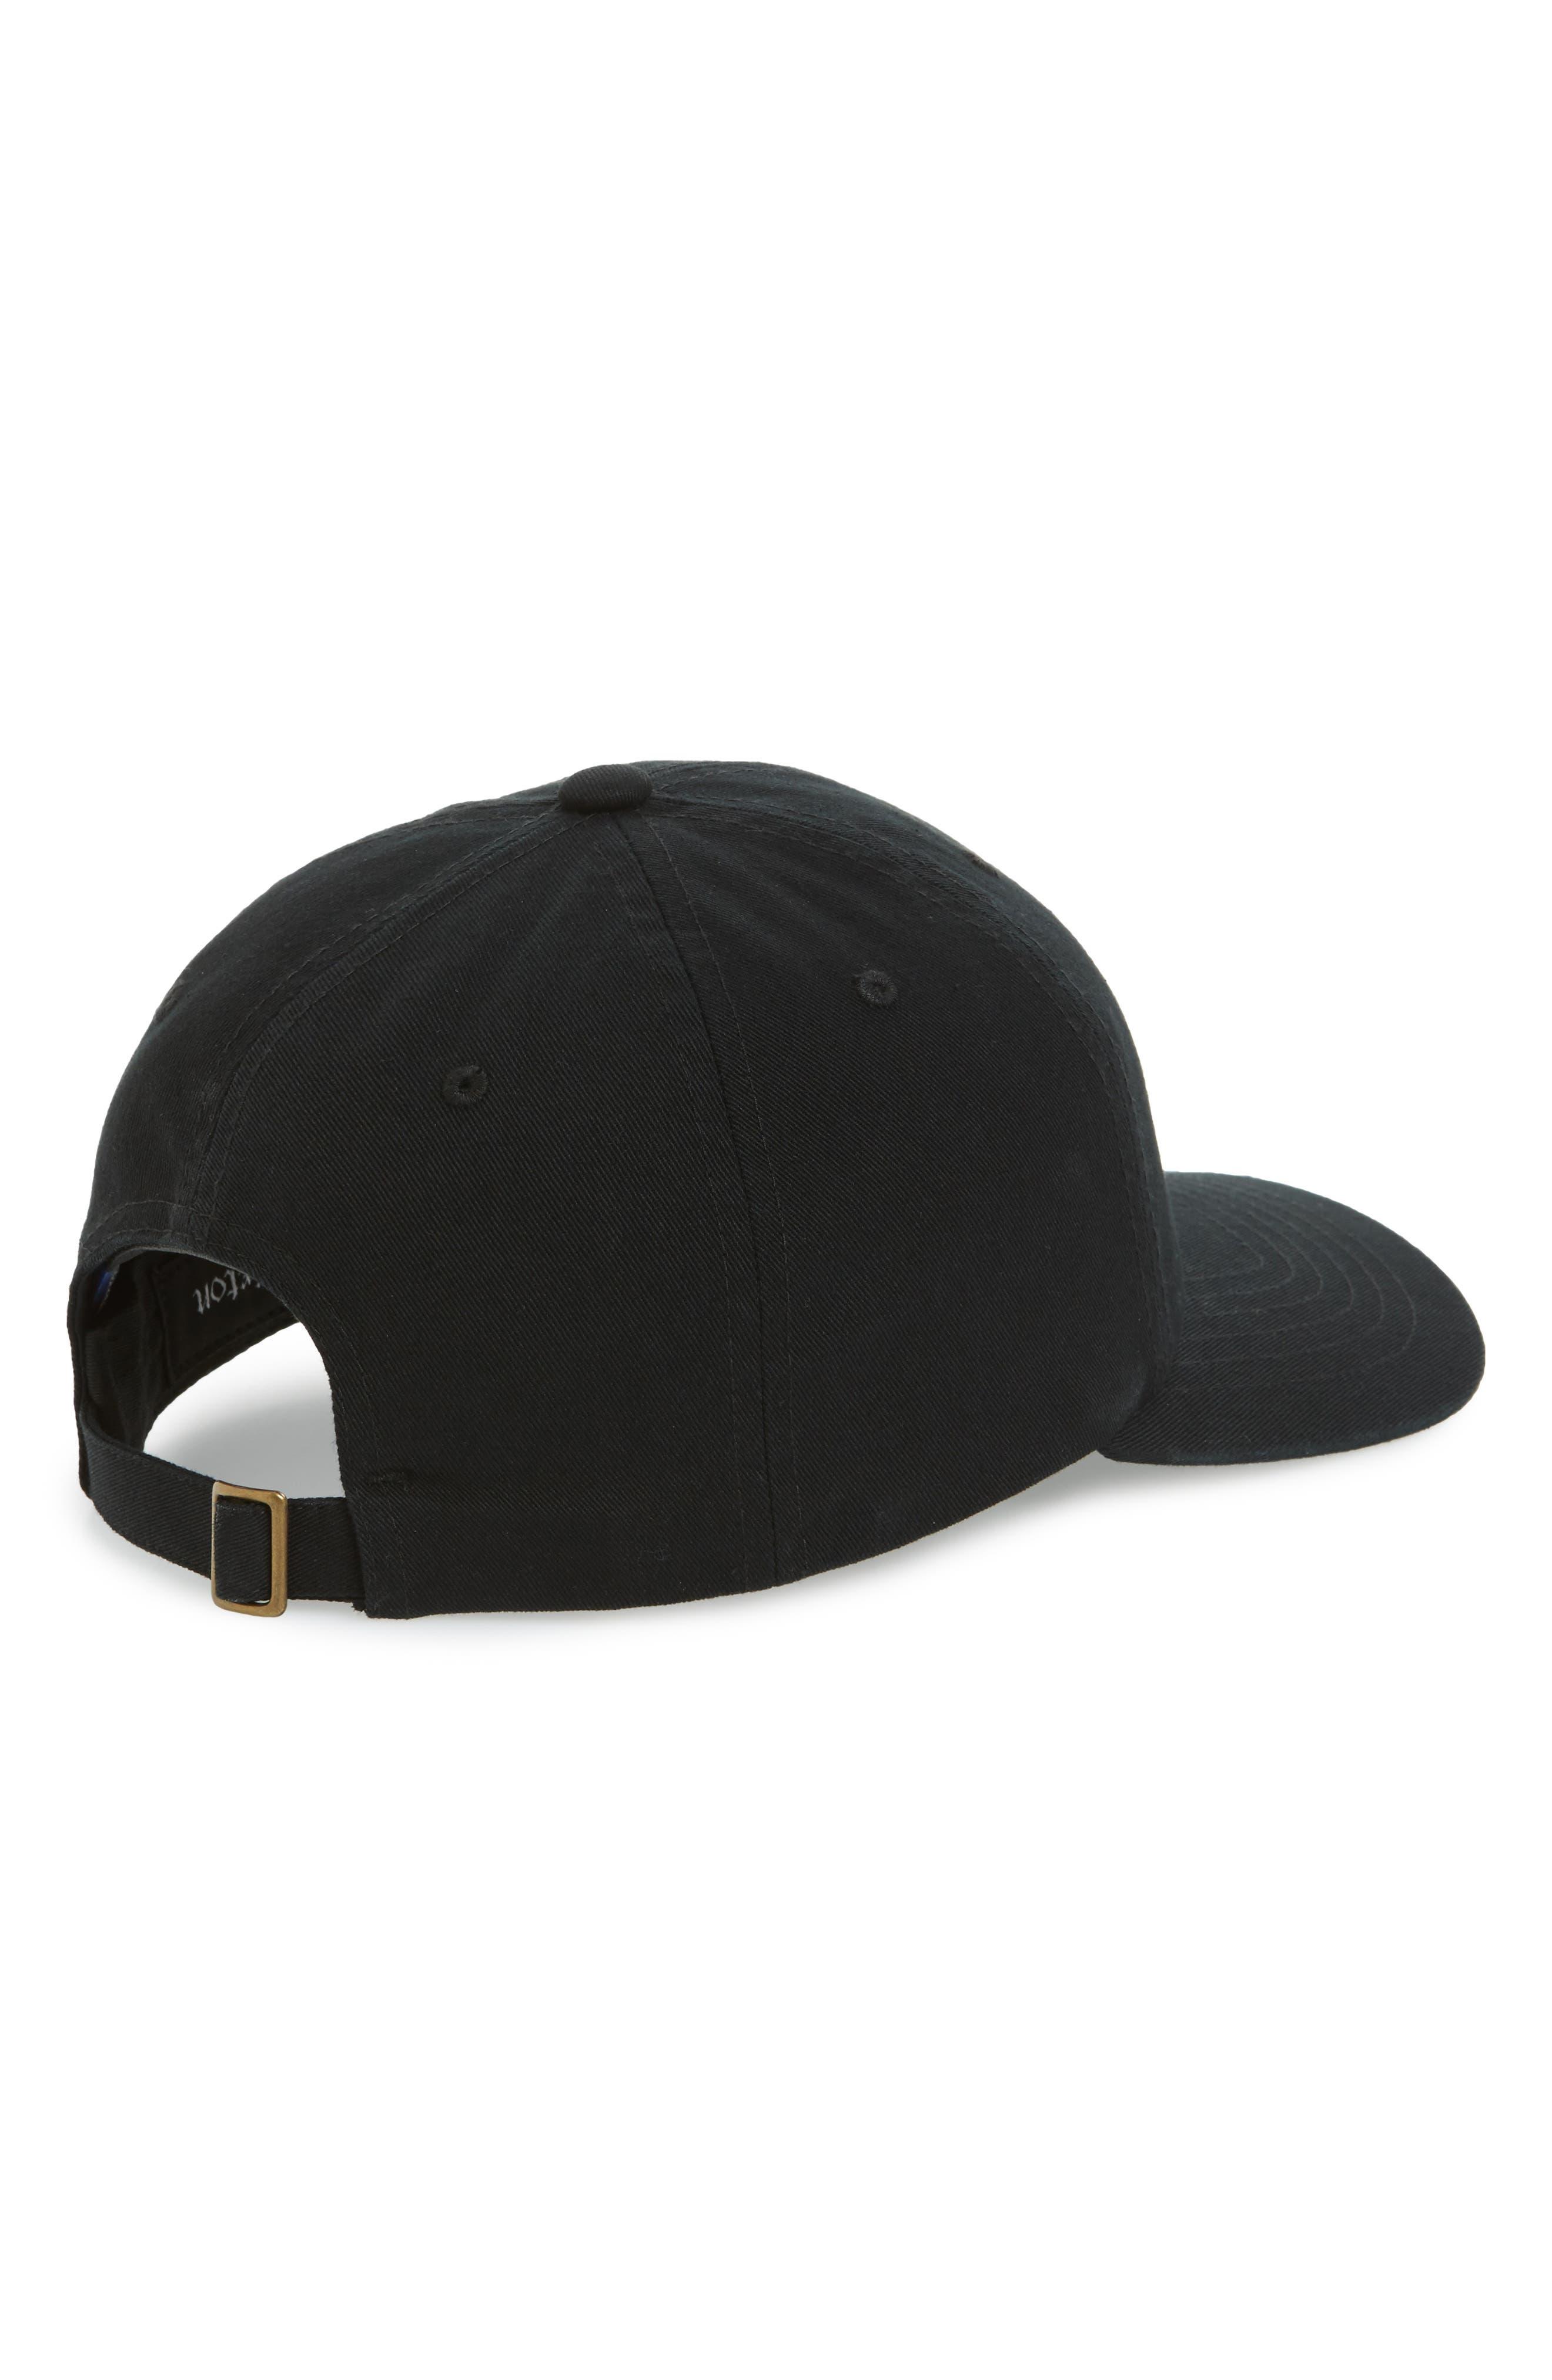 Stowell Baseball Cap,                             Alternate thumbnail 2, color,                             001